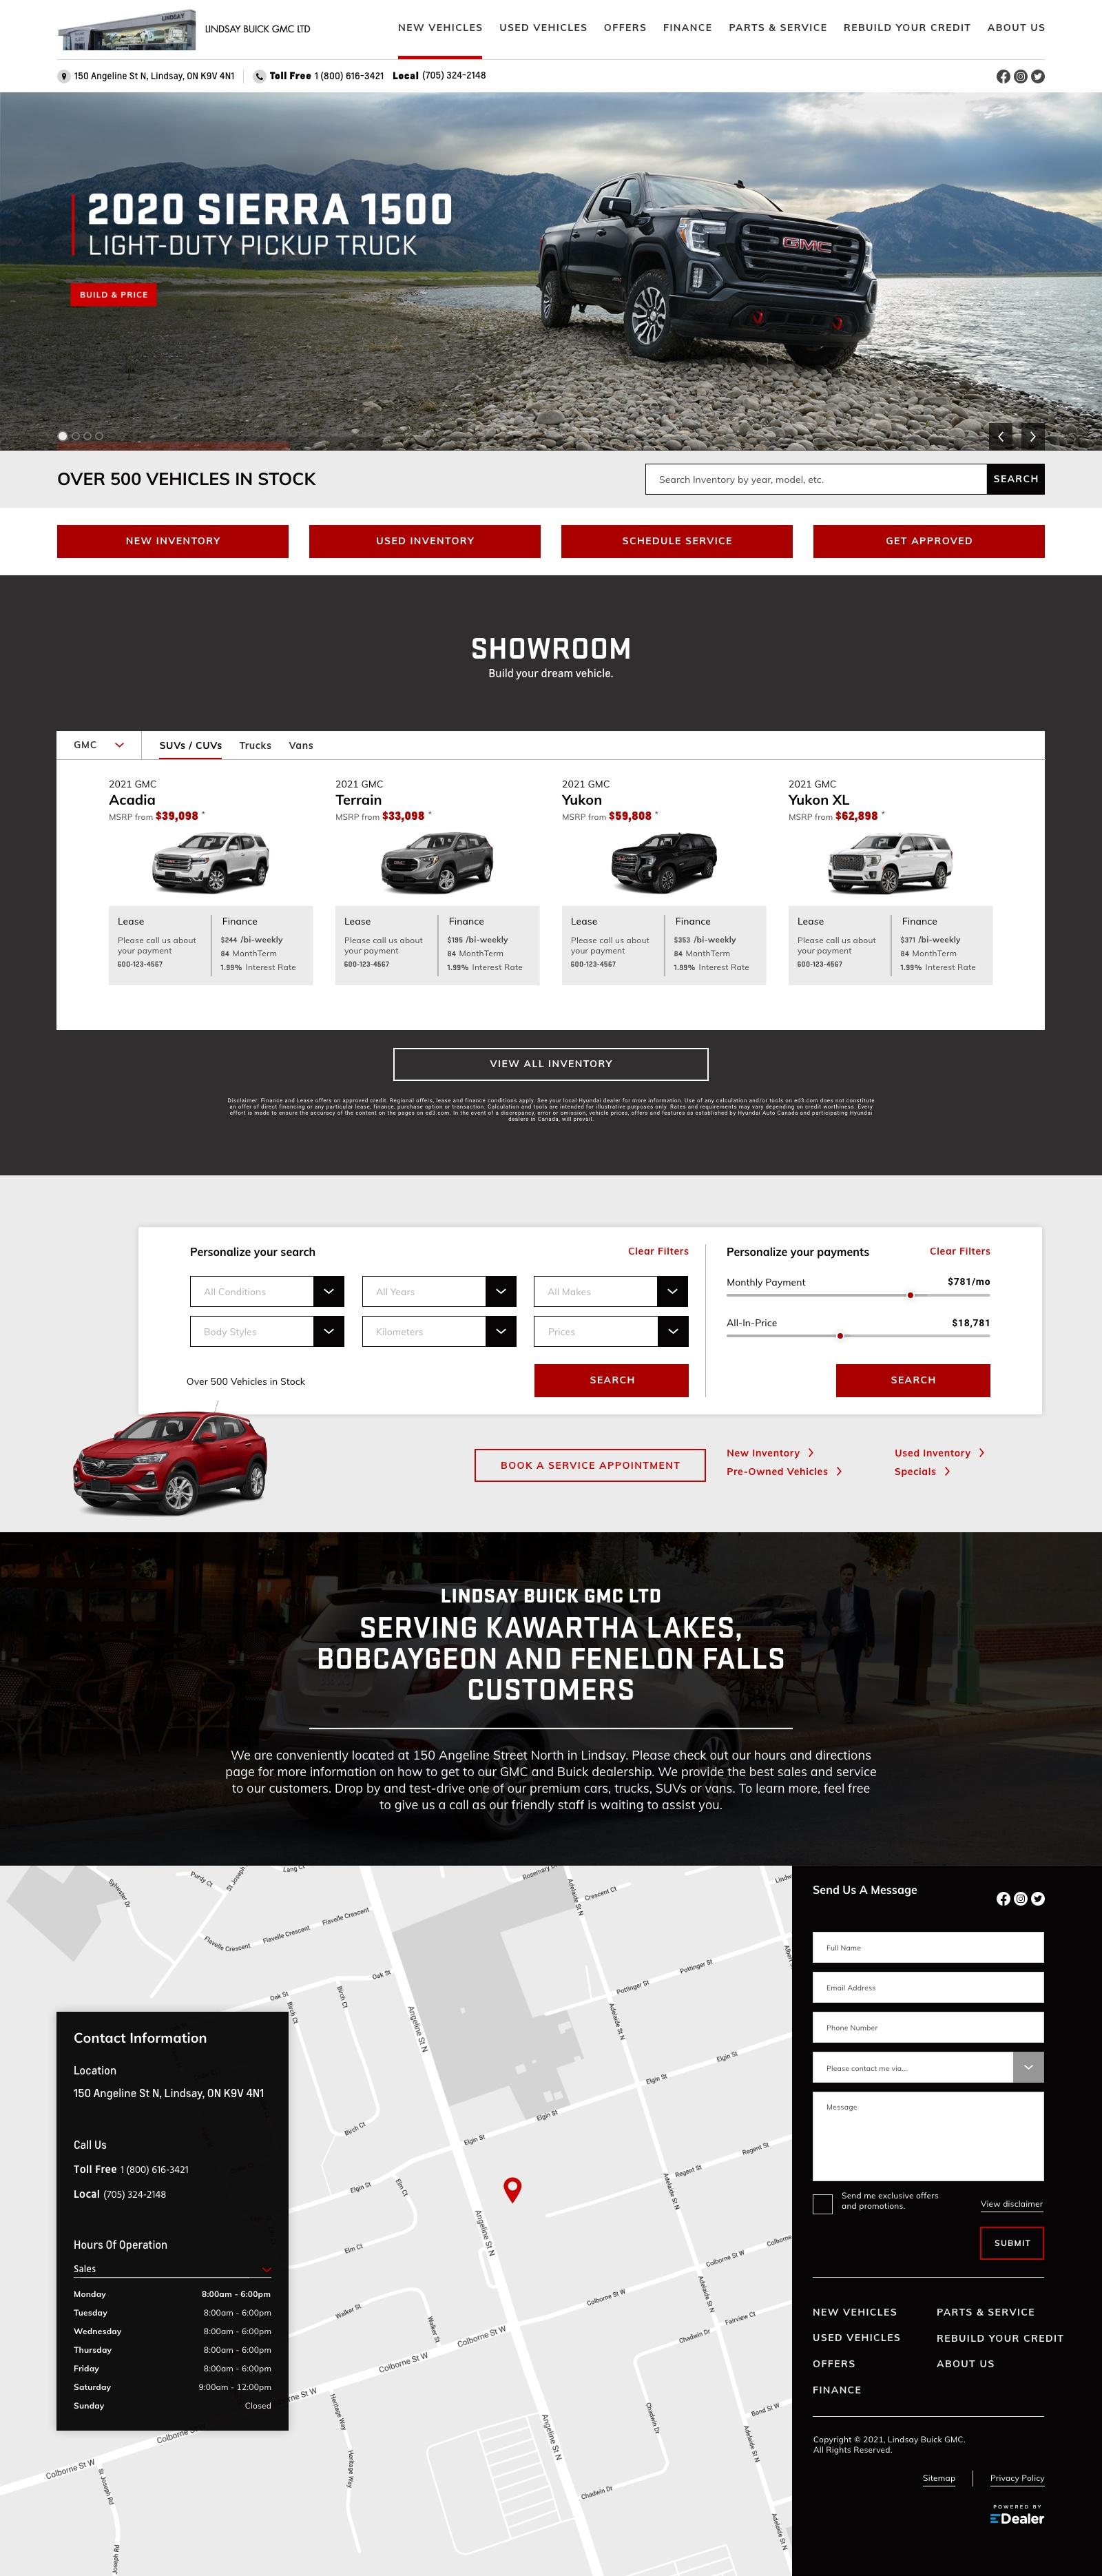 Lindsay Buick GMC Ltd